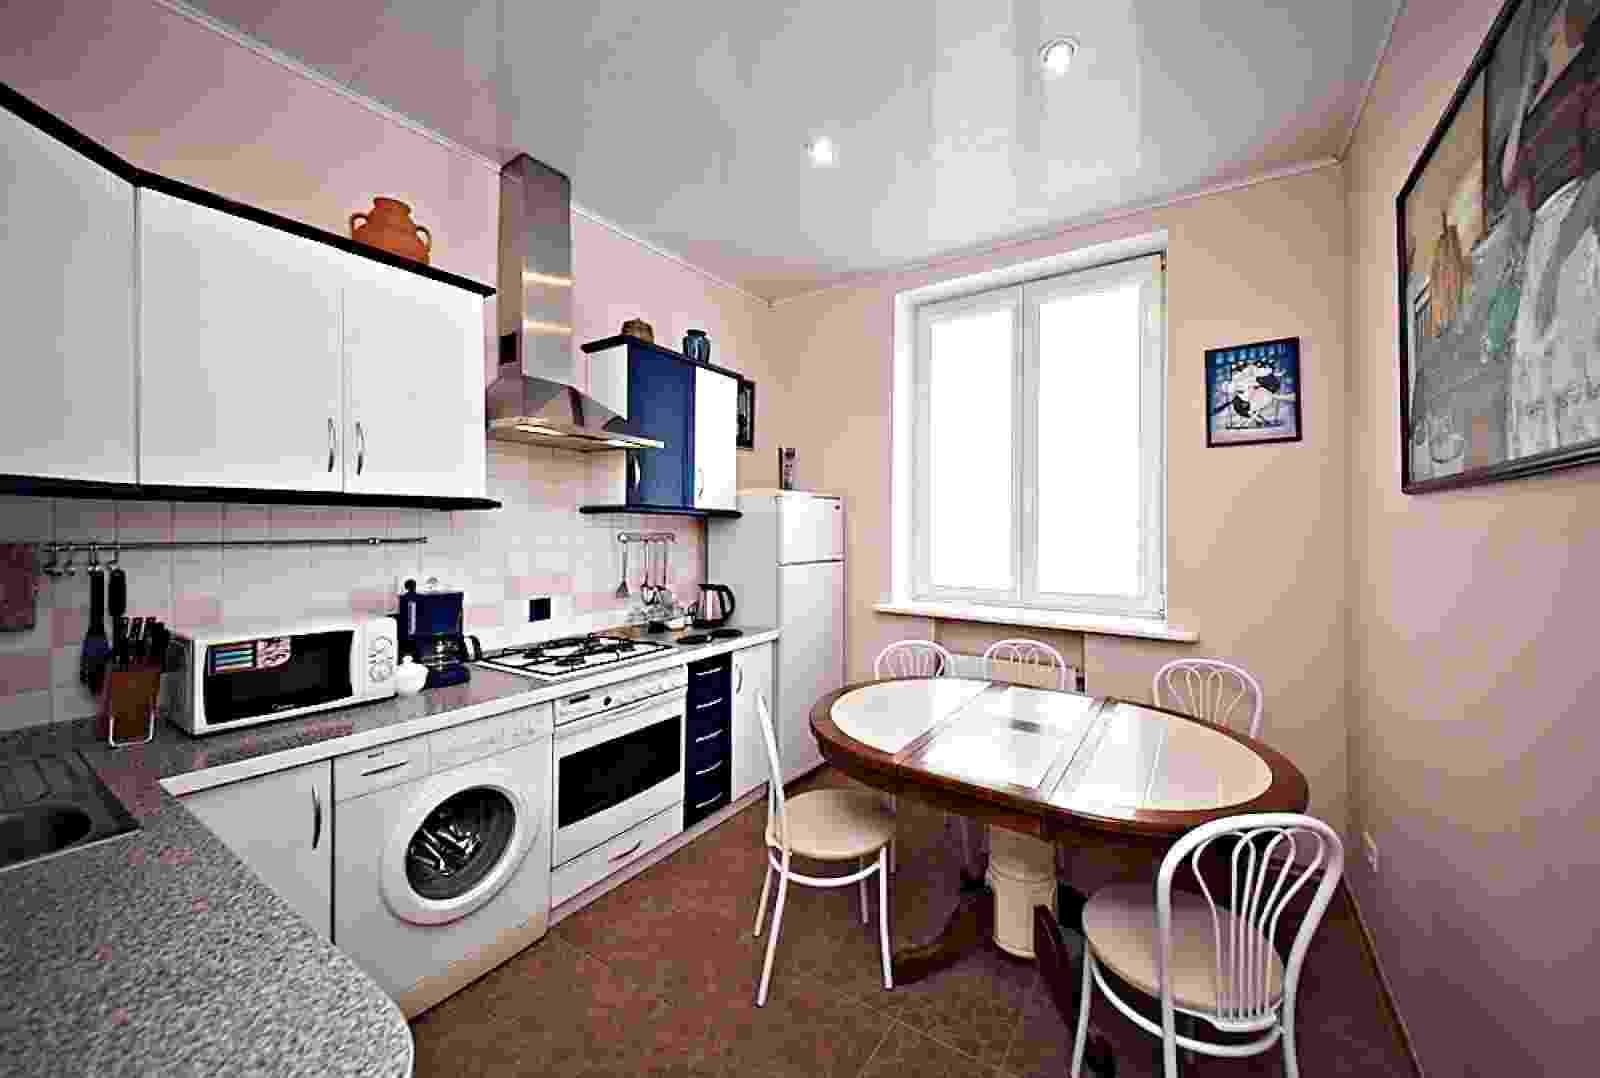 2-ком квартира -студия в самом центре Минска проспект Независимости 52 (ЦЕНТР),ст. метро Якуба Коласа.Без посредников. Фото